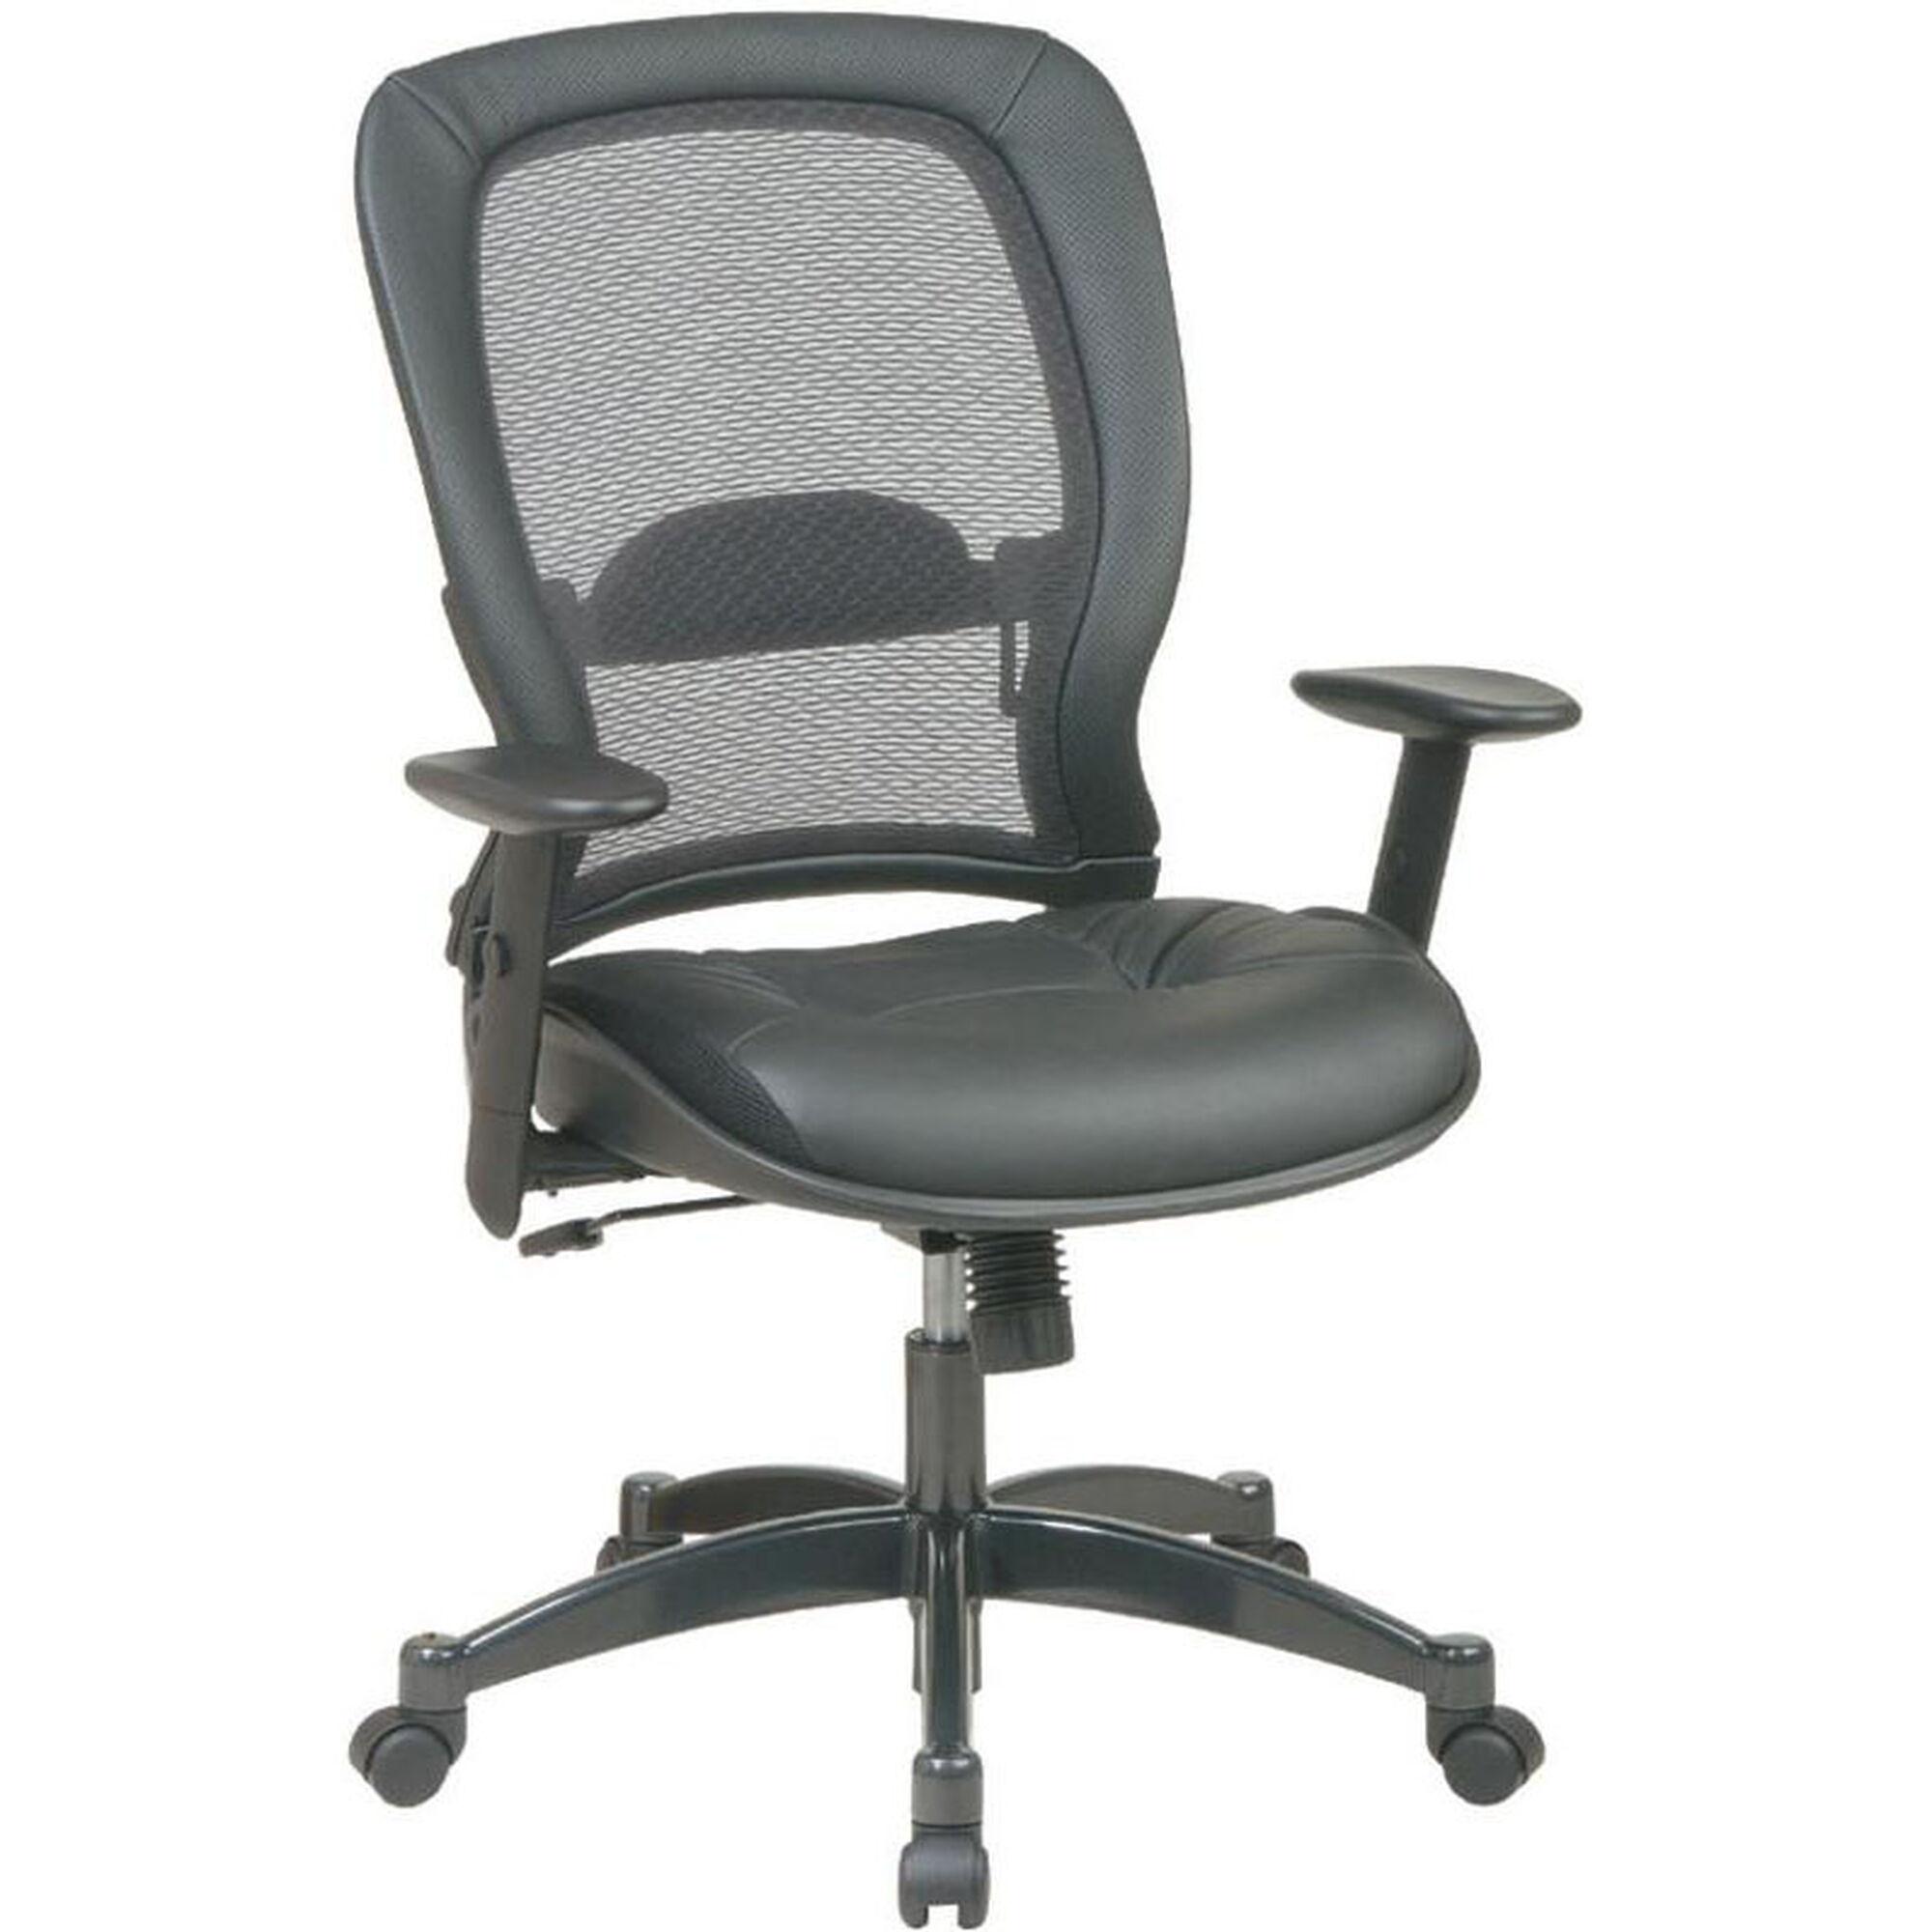 High Point Furniture Industries 751 Hpf